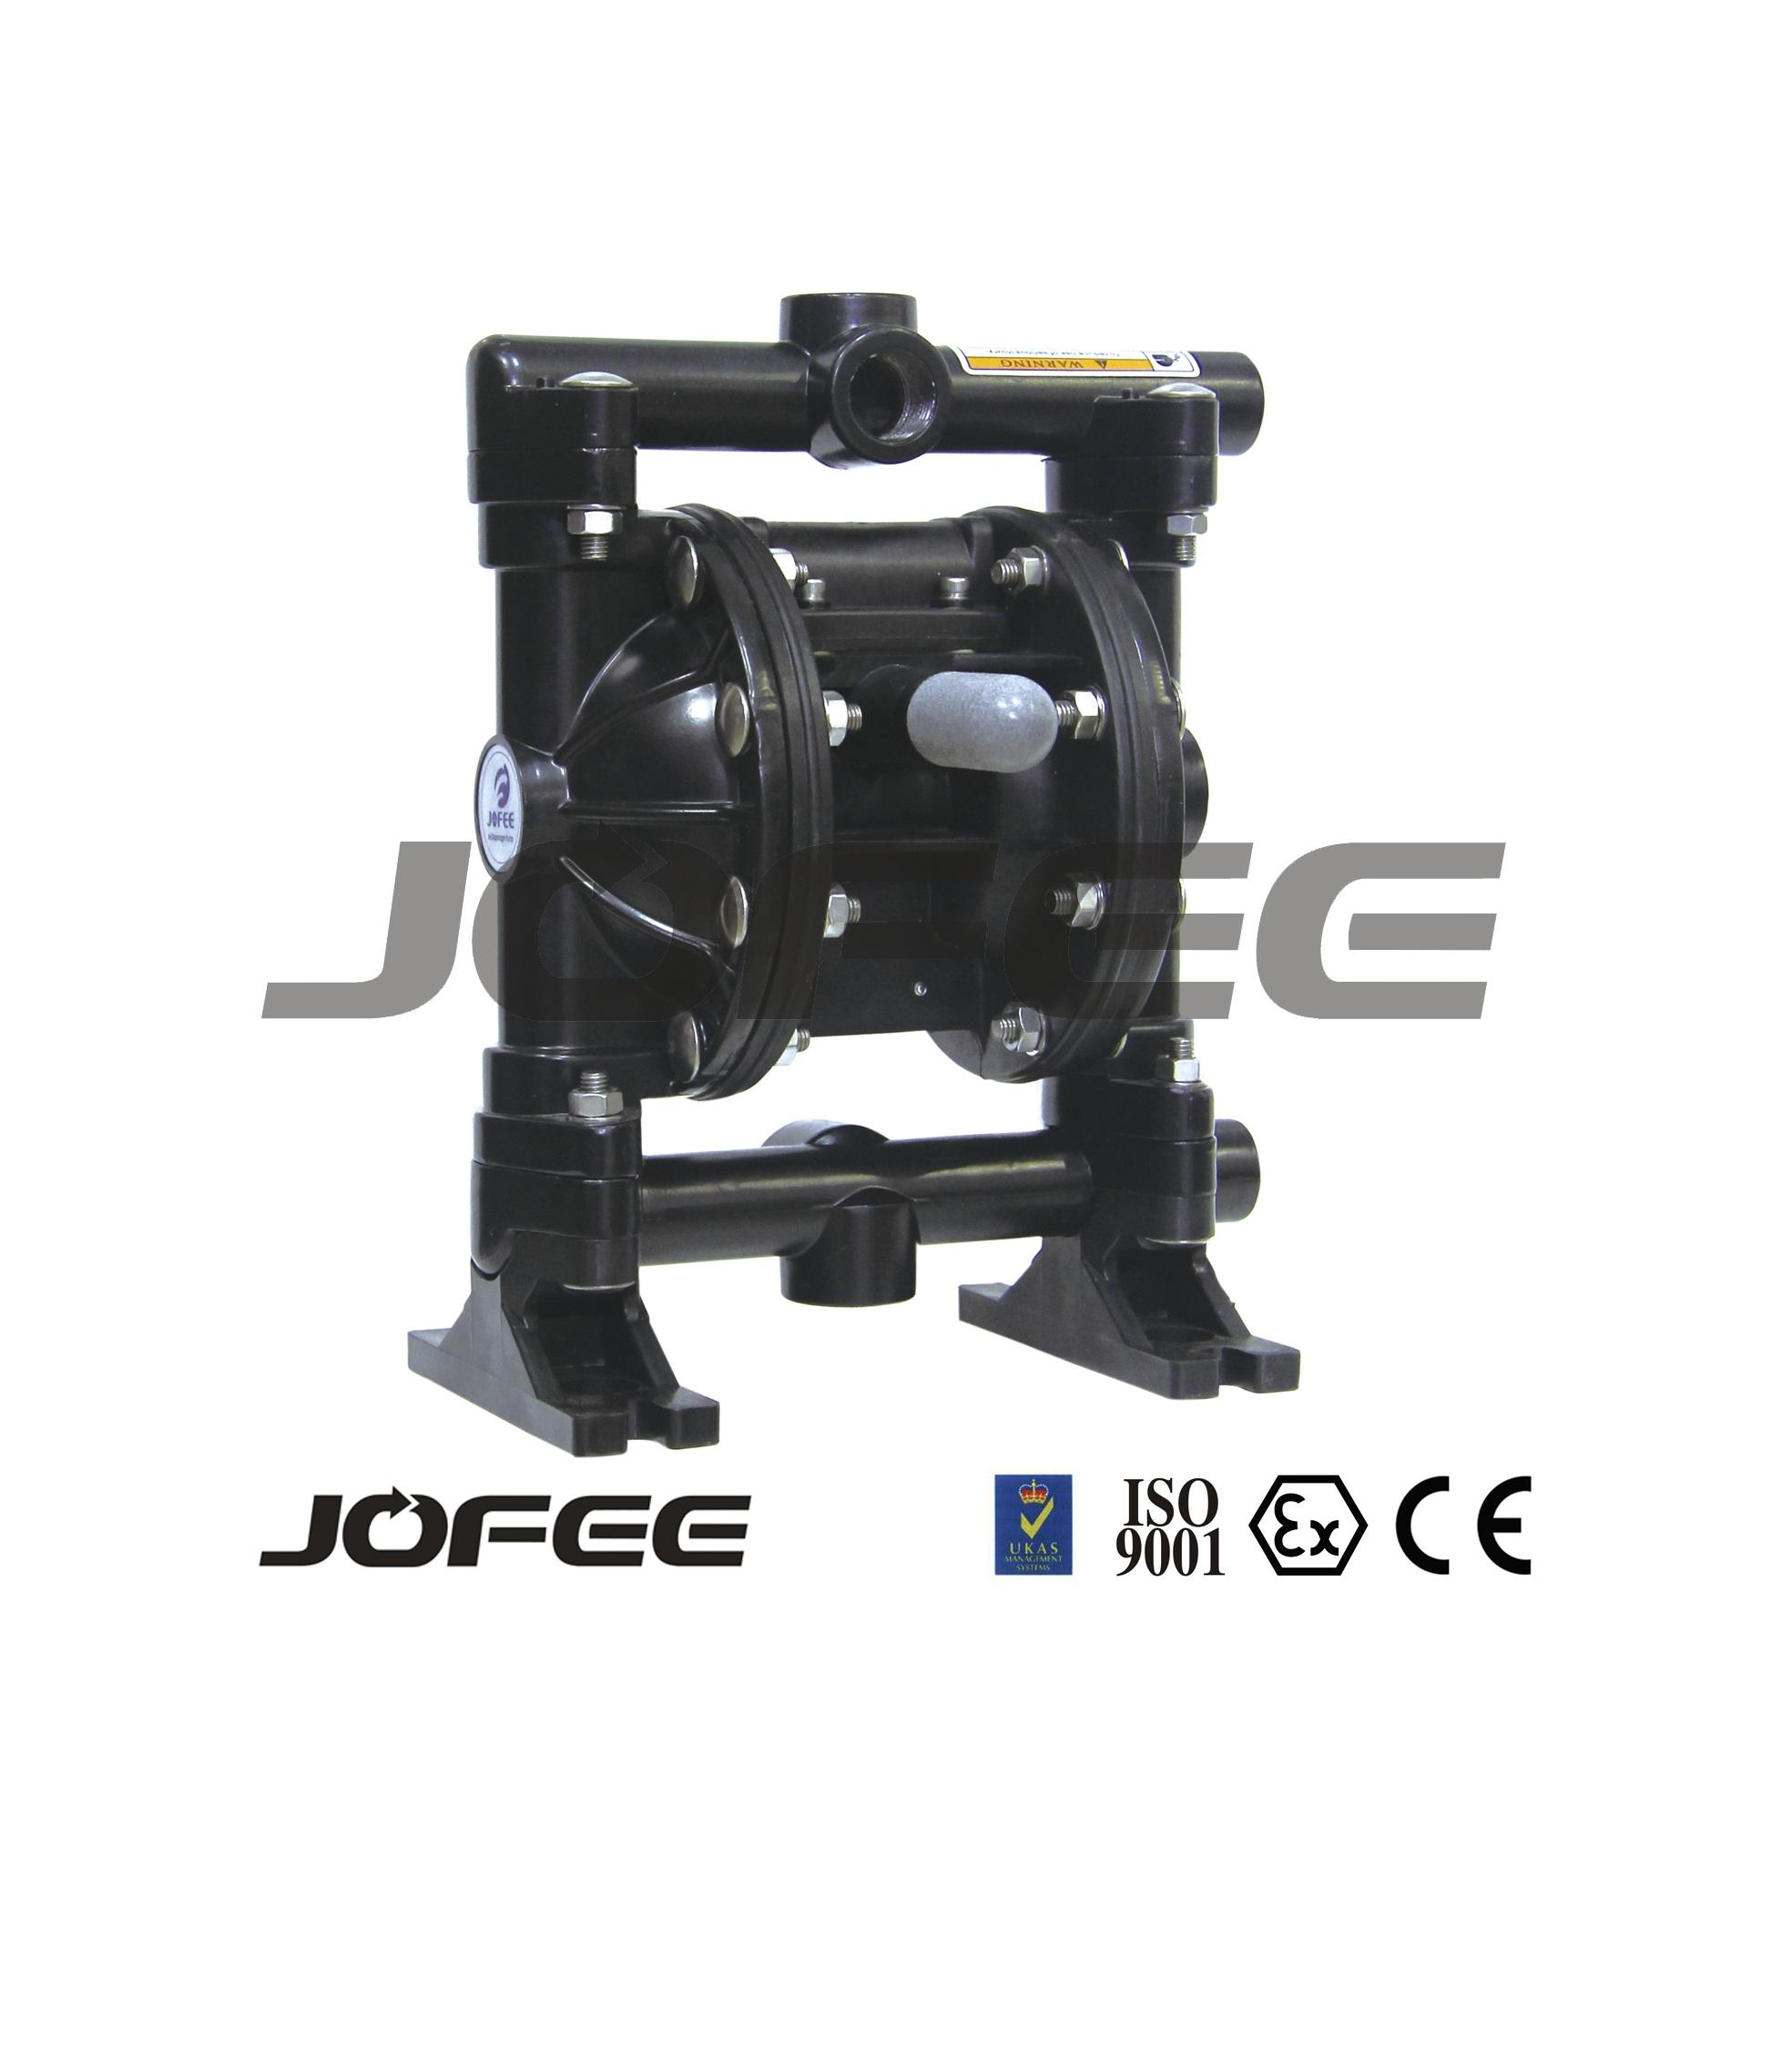 bom-mang-jofee-mk15-m